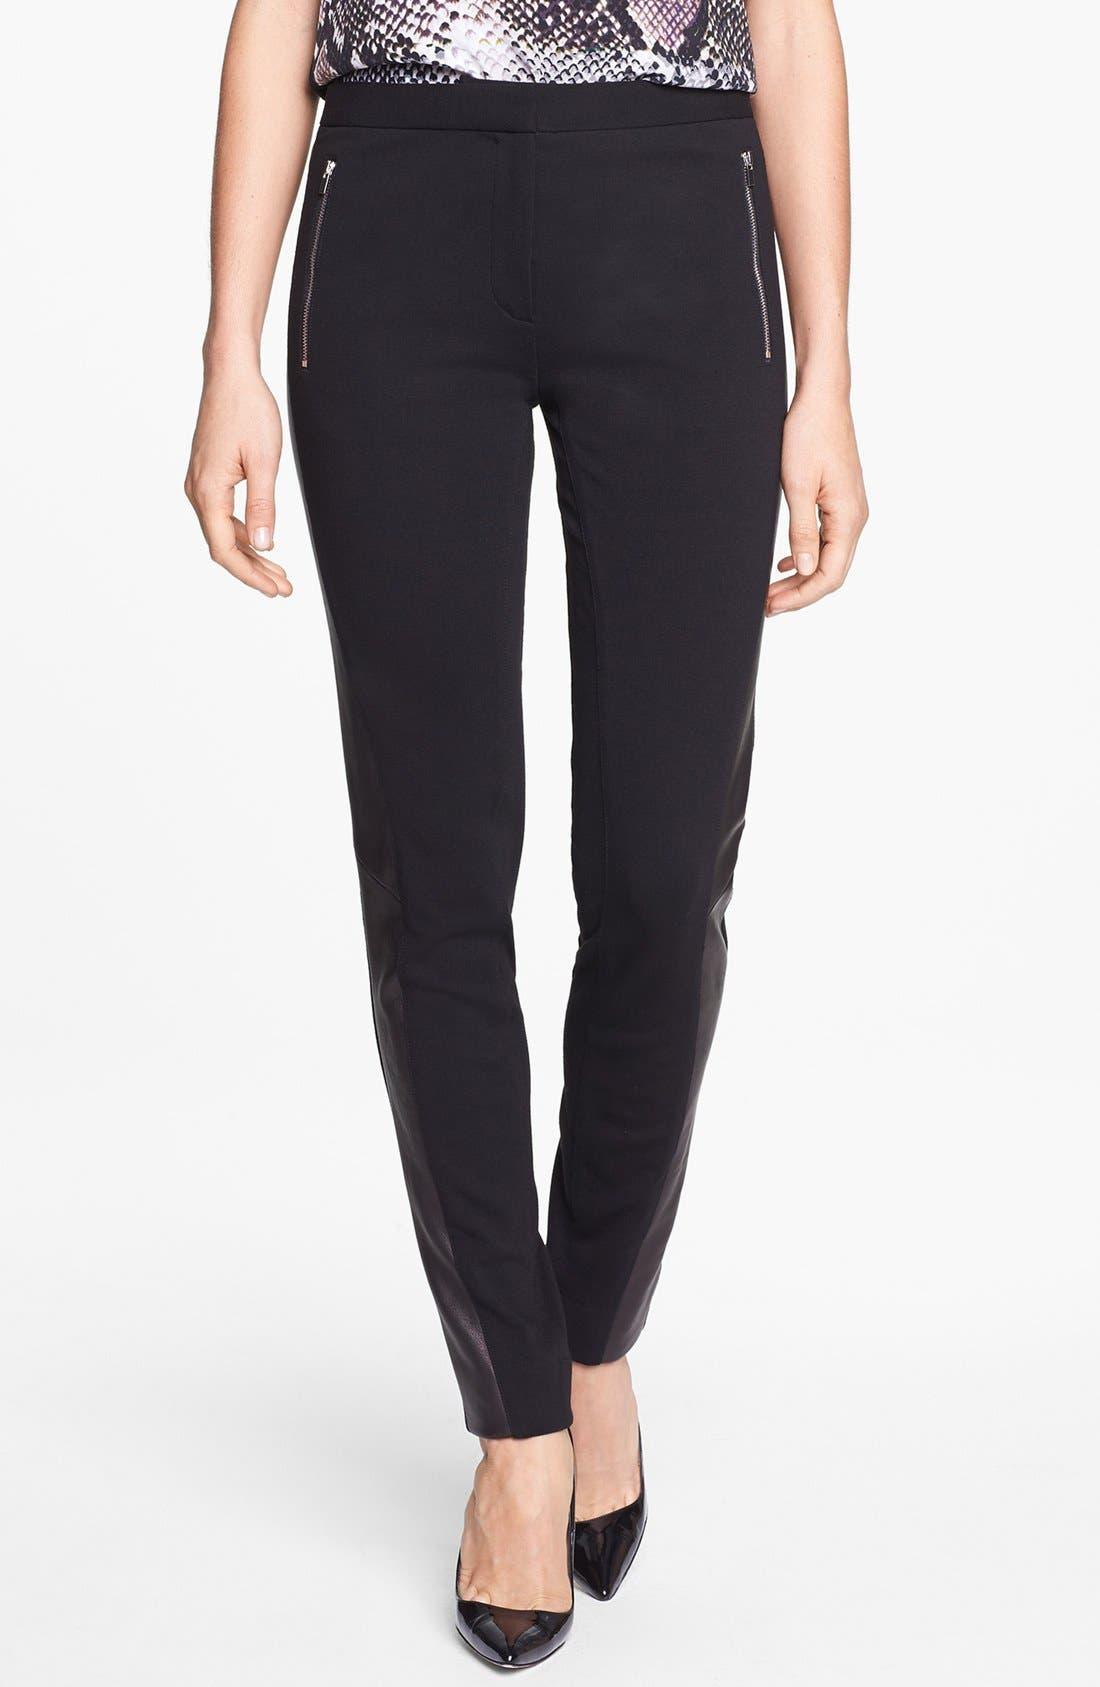 Alternate Image 1 Selected - Diane von Furstenberg 'Leah' Leather & Pont Pants